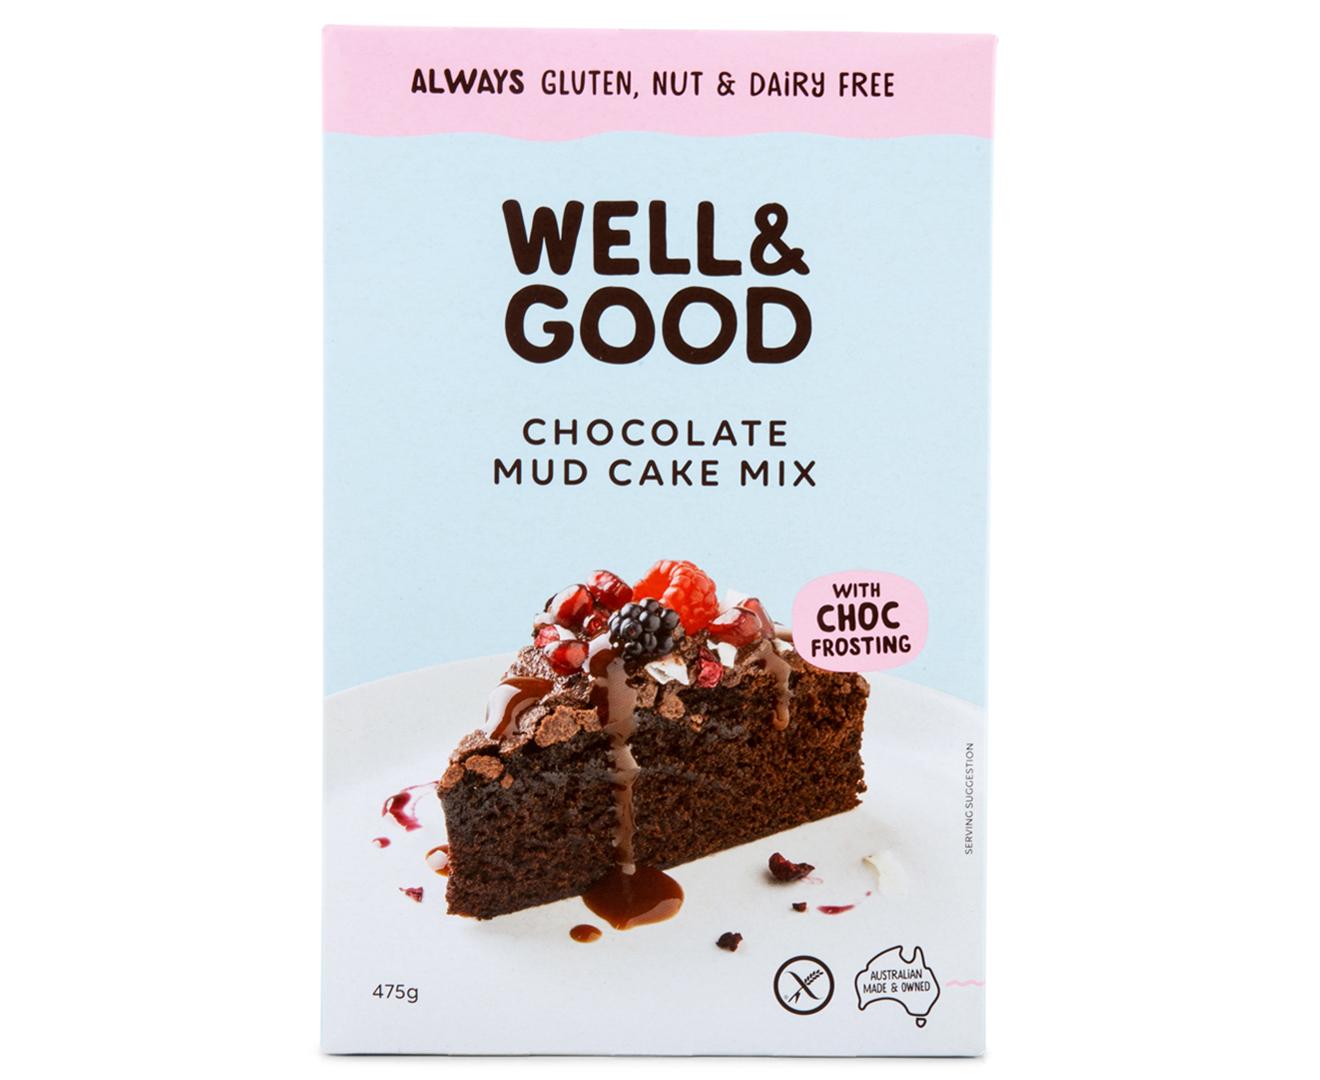 2 X Well Amp Good Gluten Nut Amp Dairy Free Chocolate Mud